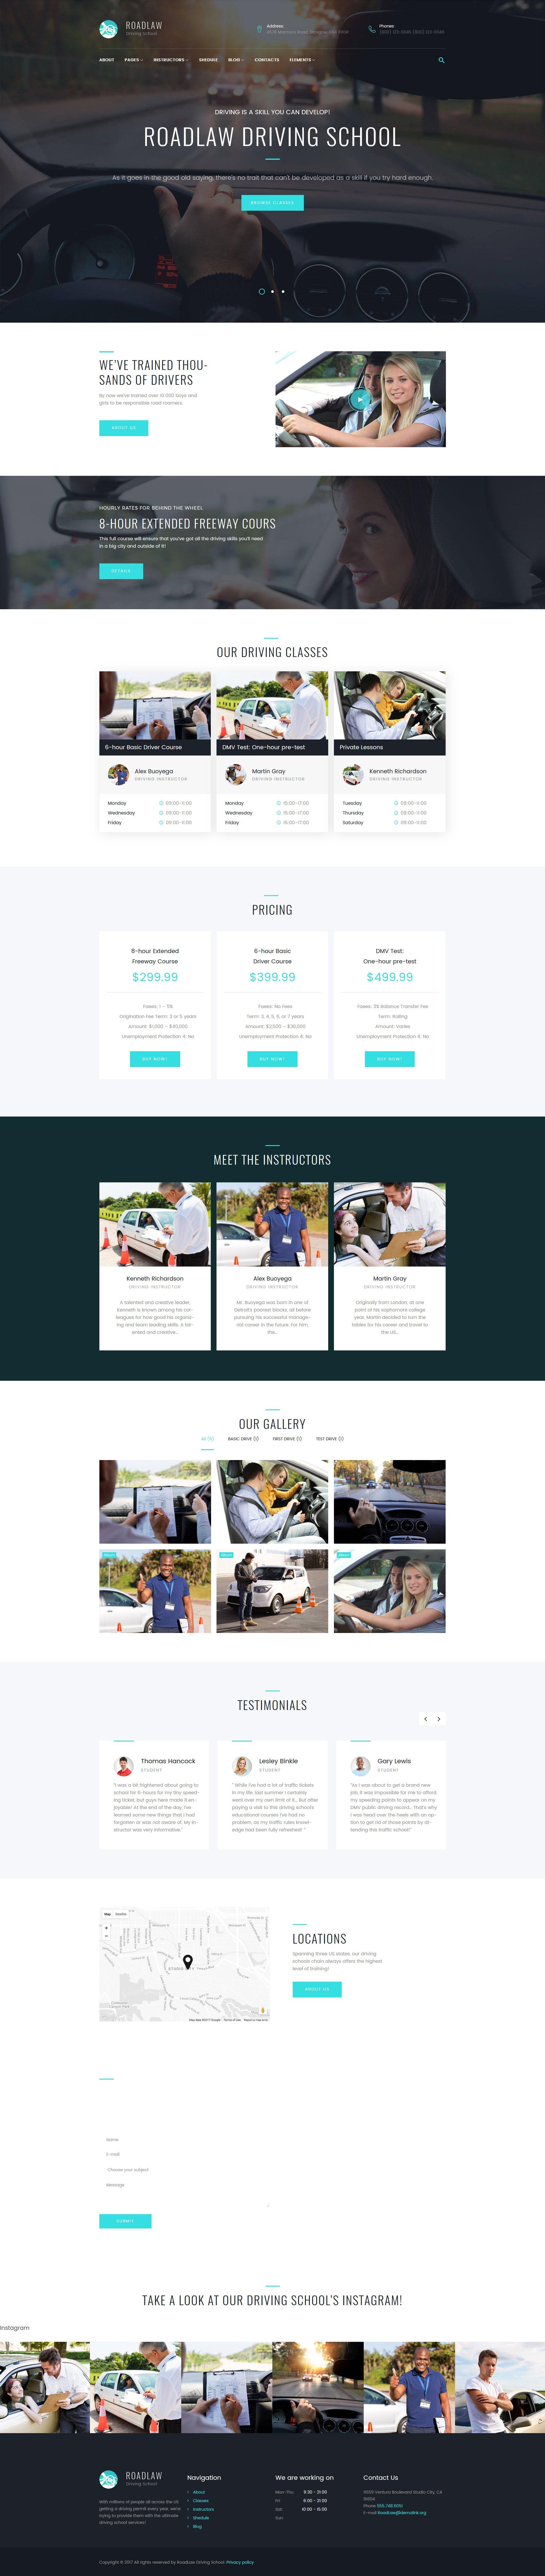 """RoadLaw - Driving School Responsive WordPress Theme"" 响应式WordPress模板 #63631"